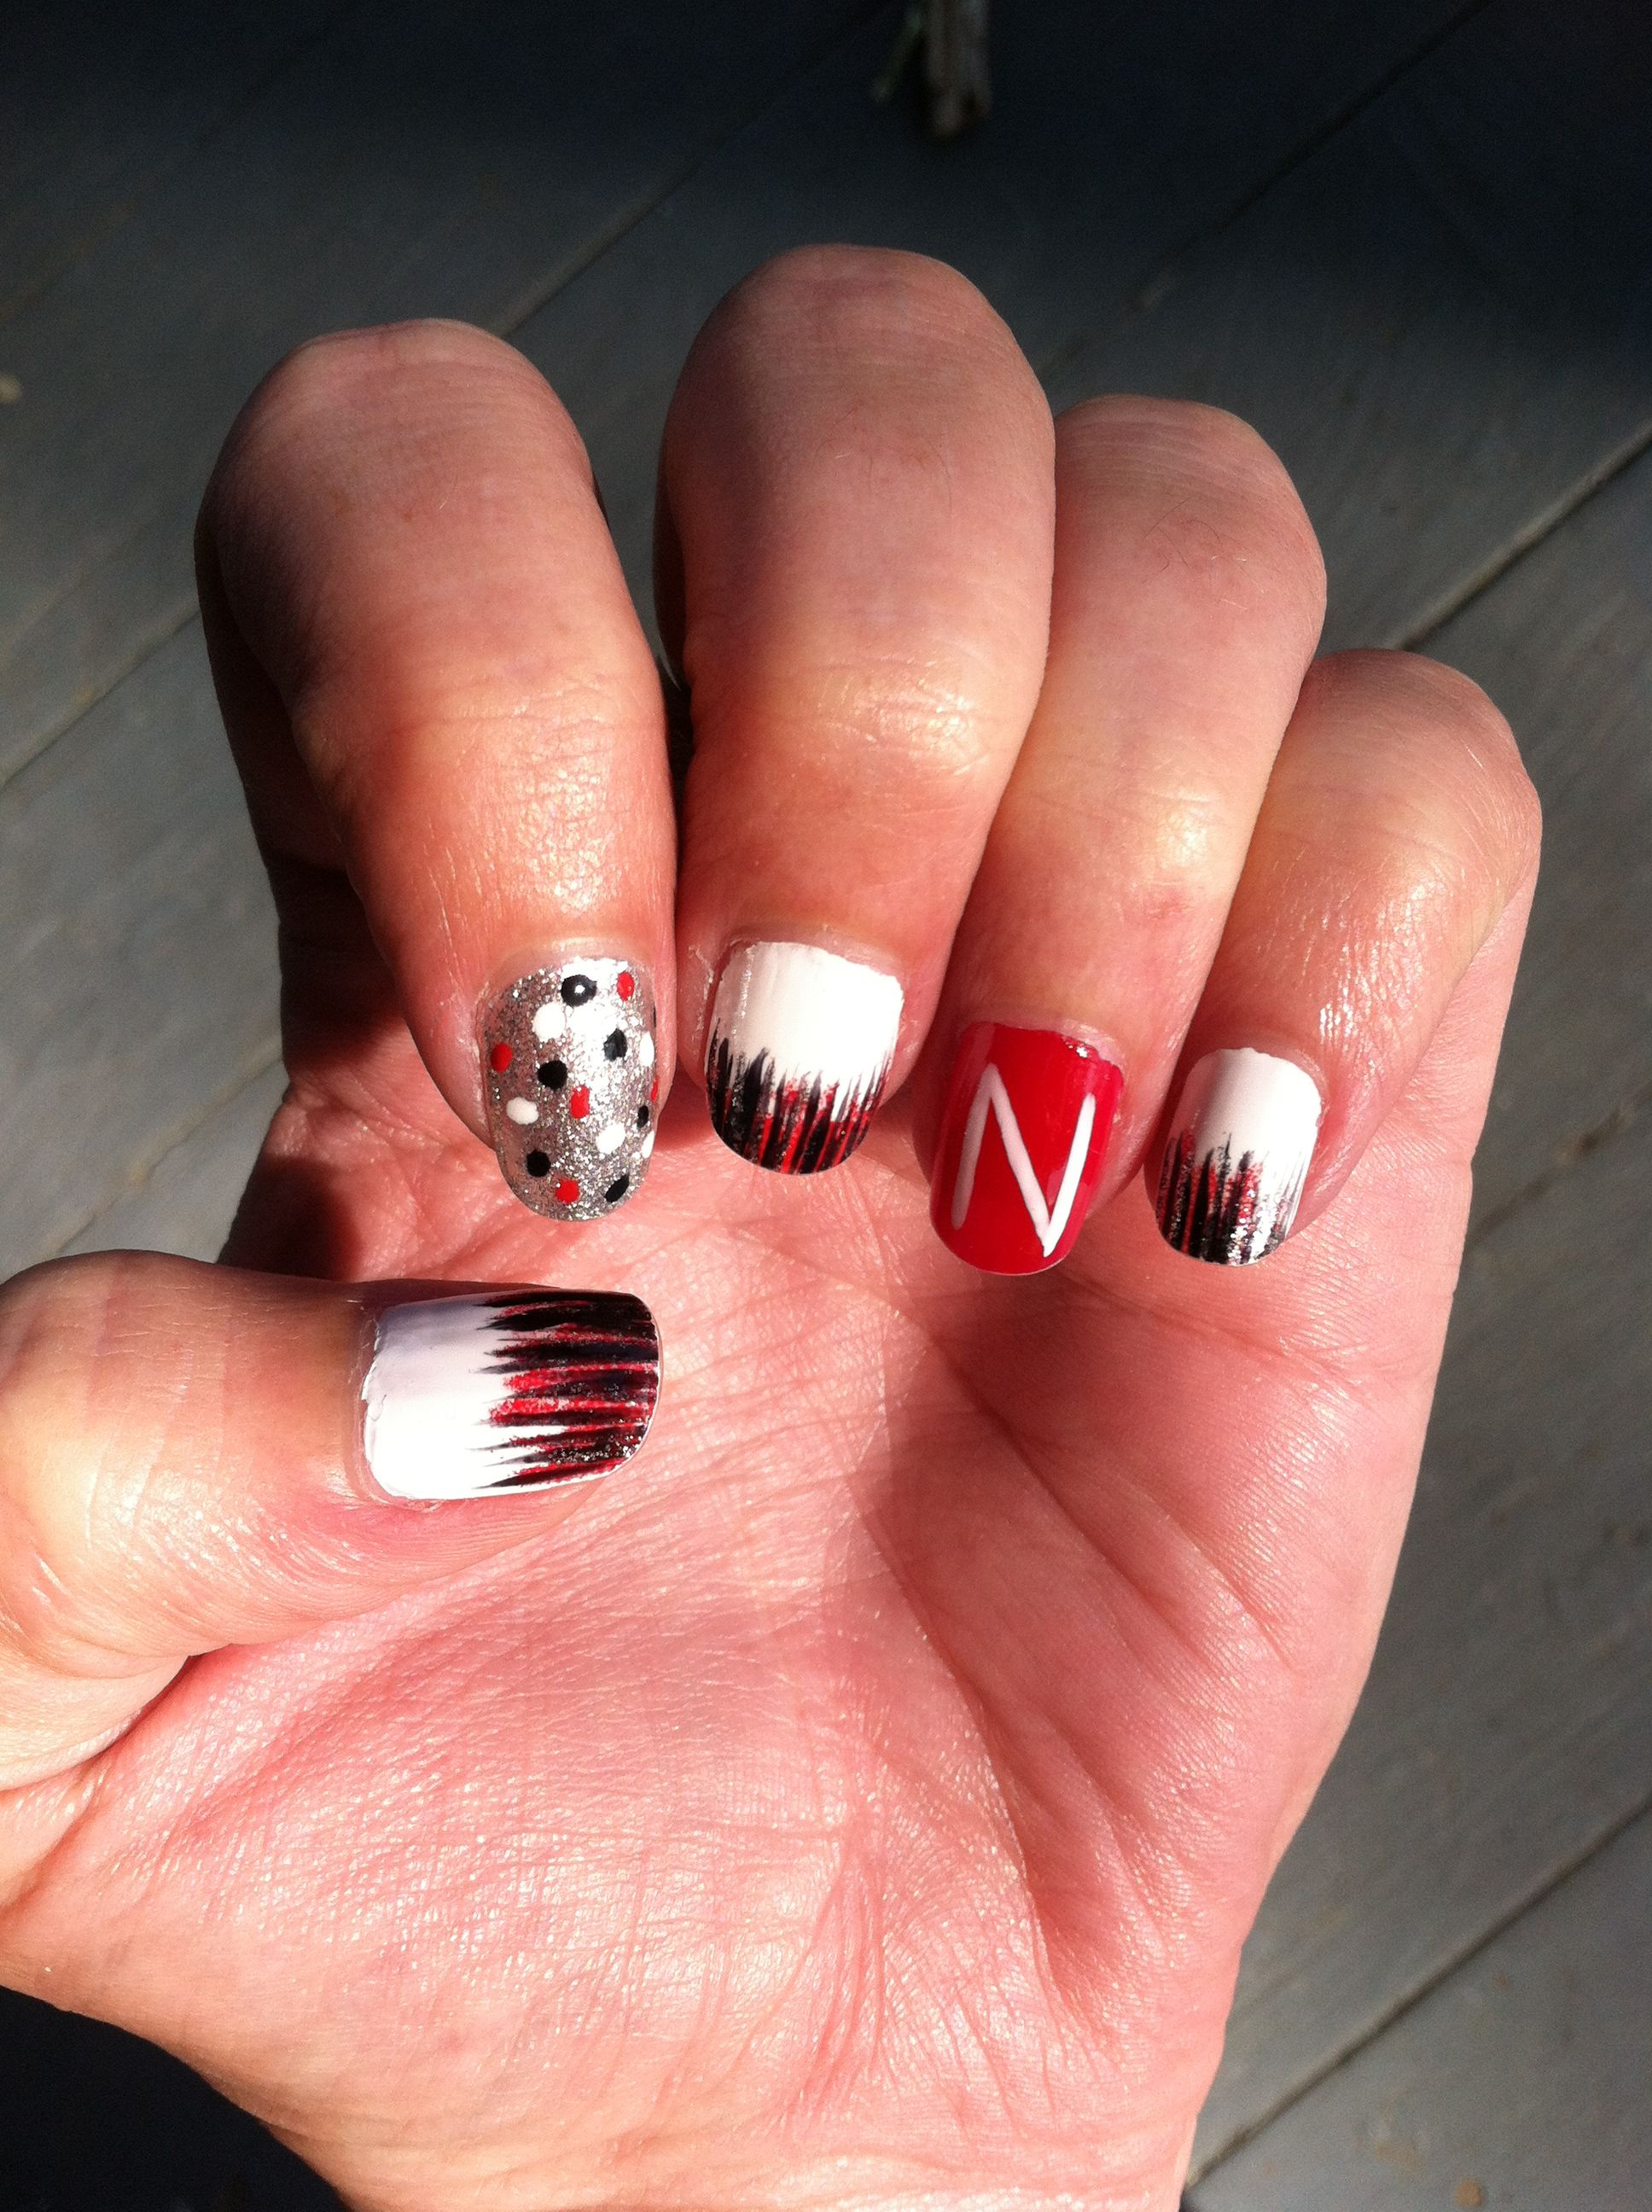 Nebraska Cornhusker Nail Art Nails Pinterest Football Nail